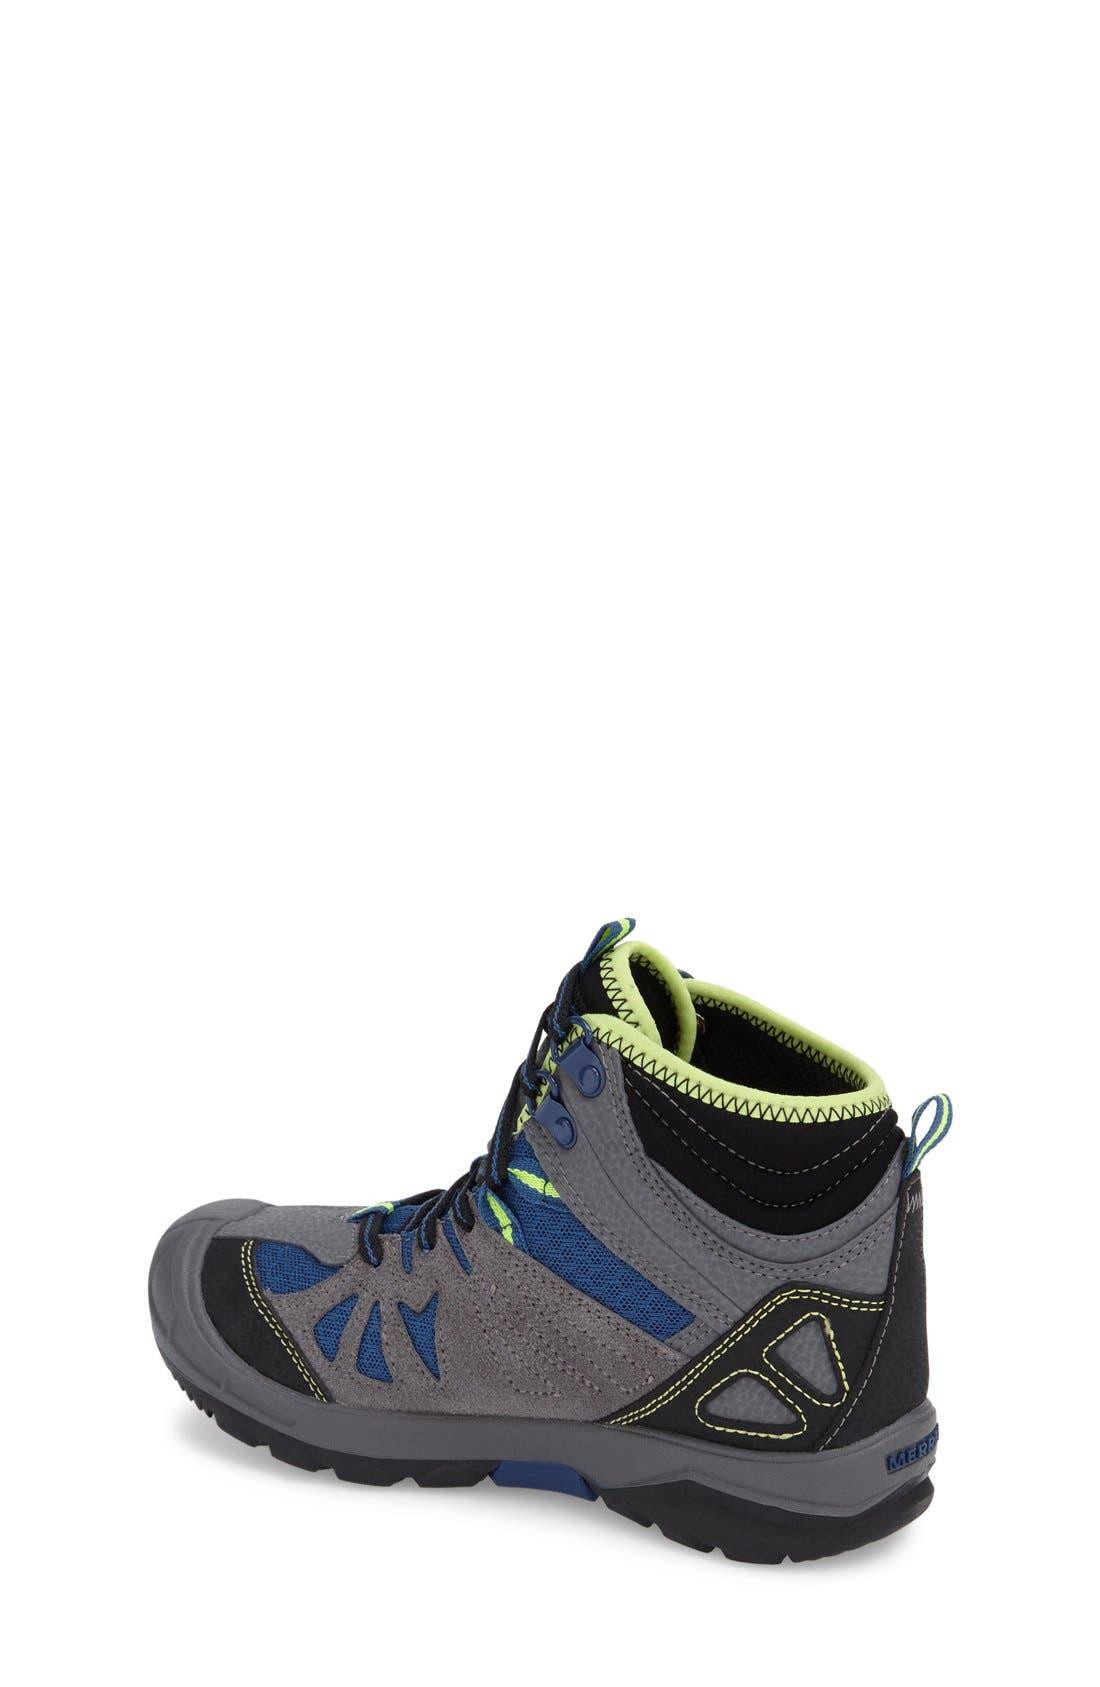 'Capra' Mid High Waterproof Boot,                             Alternate thumbnail 2, color,                             020